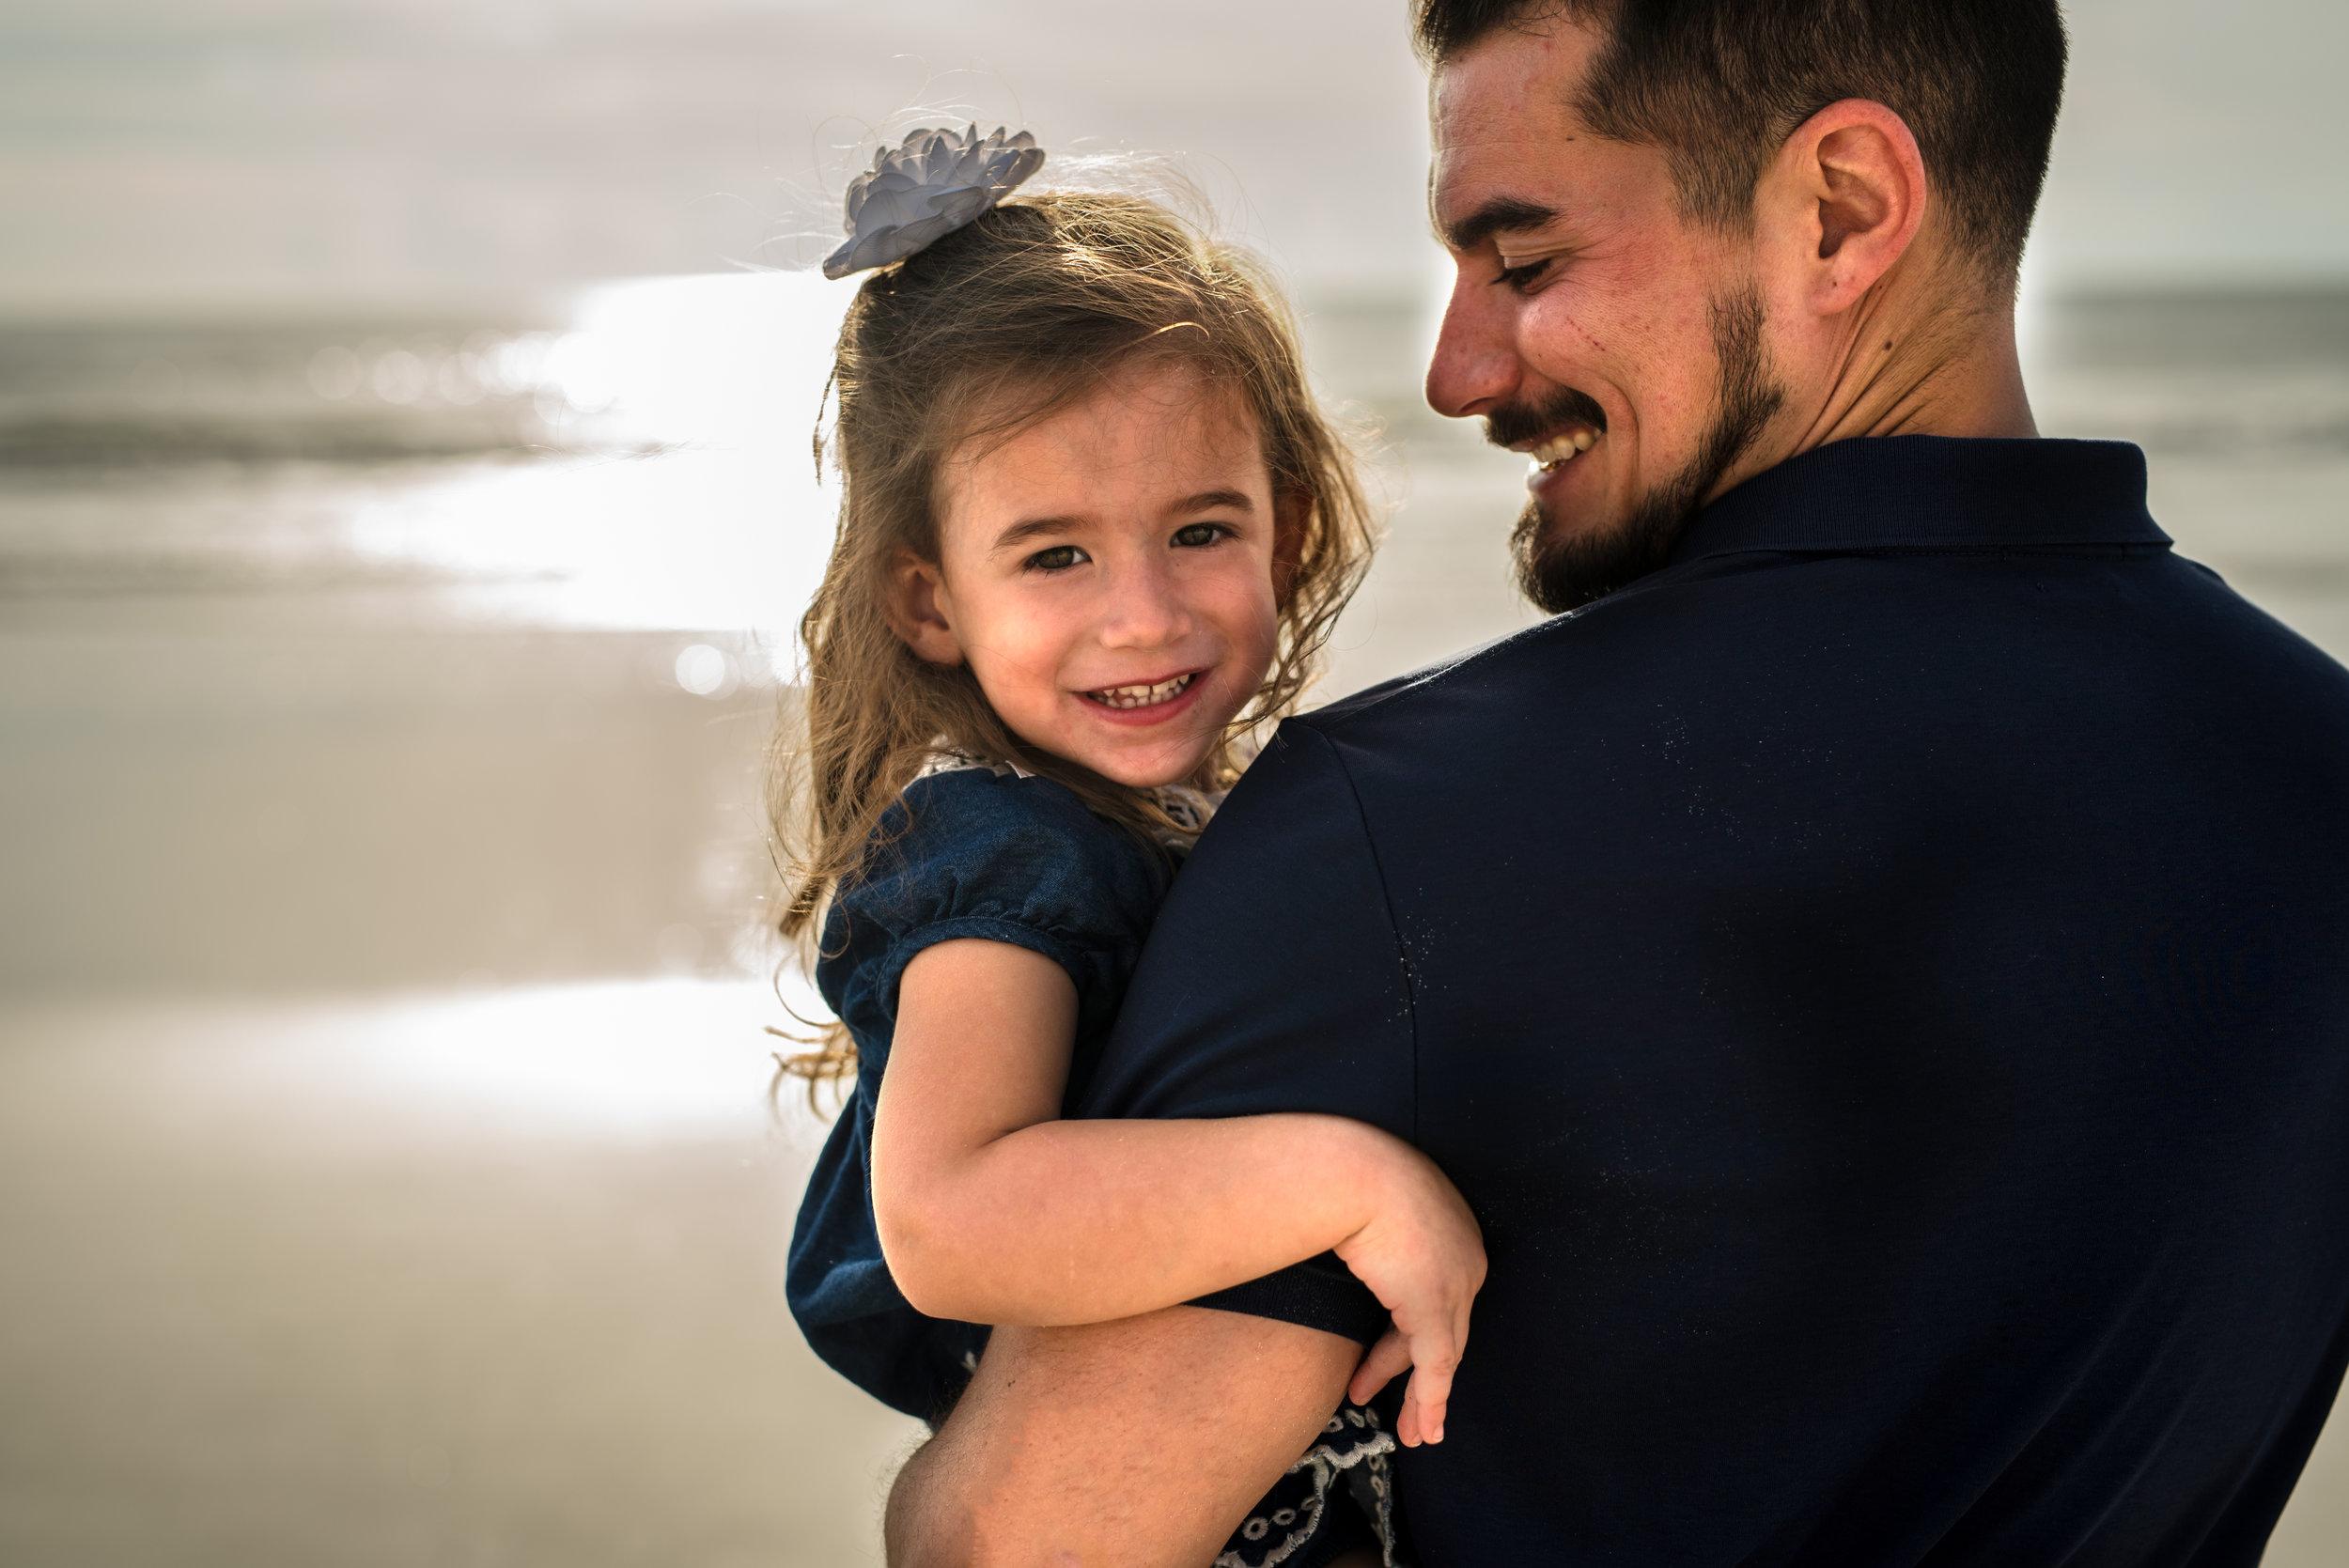 fatherdaughterbeachphotography-kristingroverimages.jpg